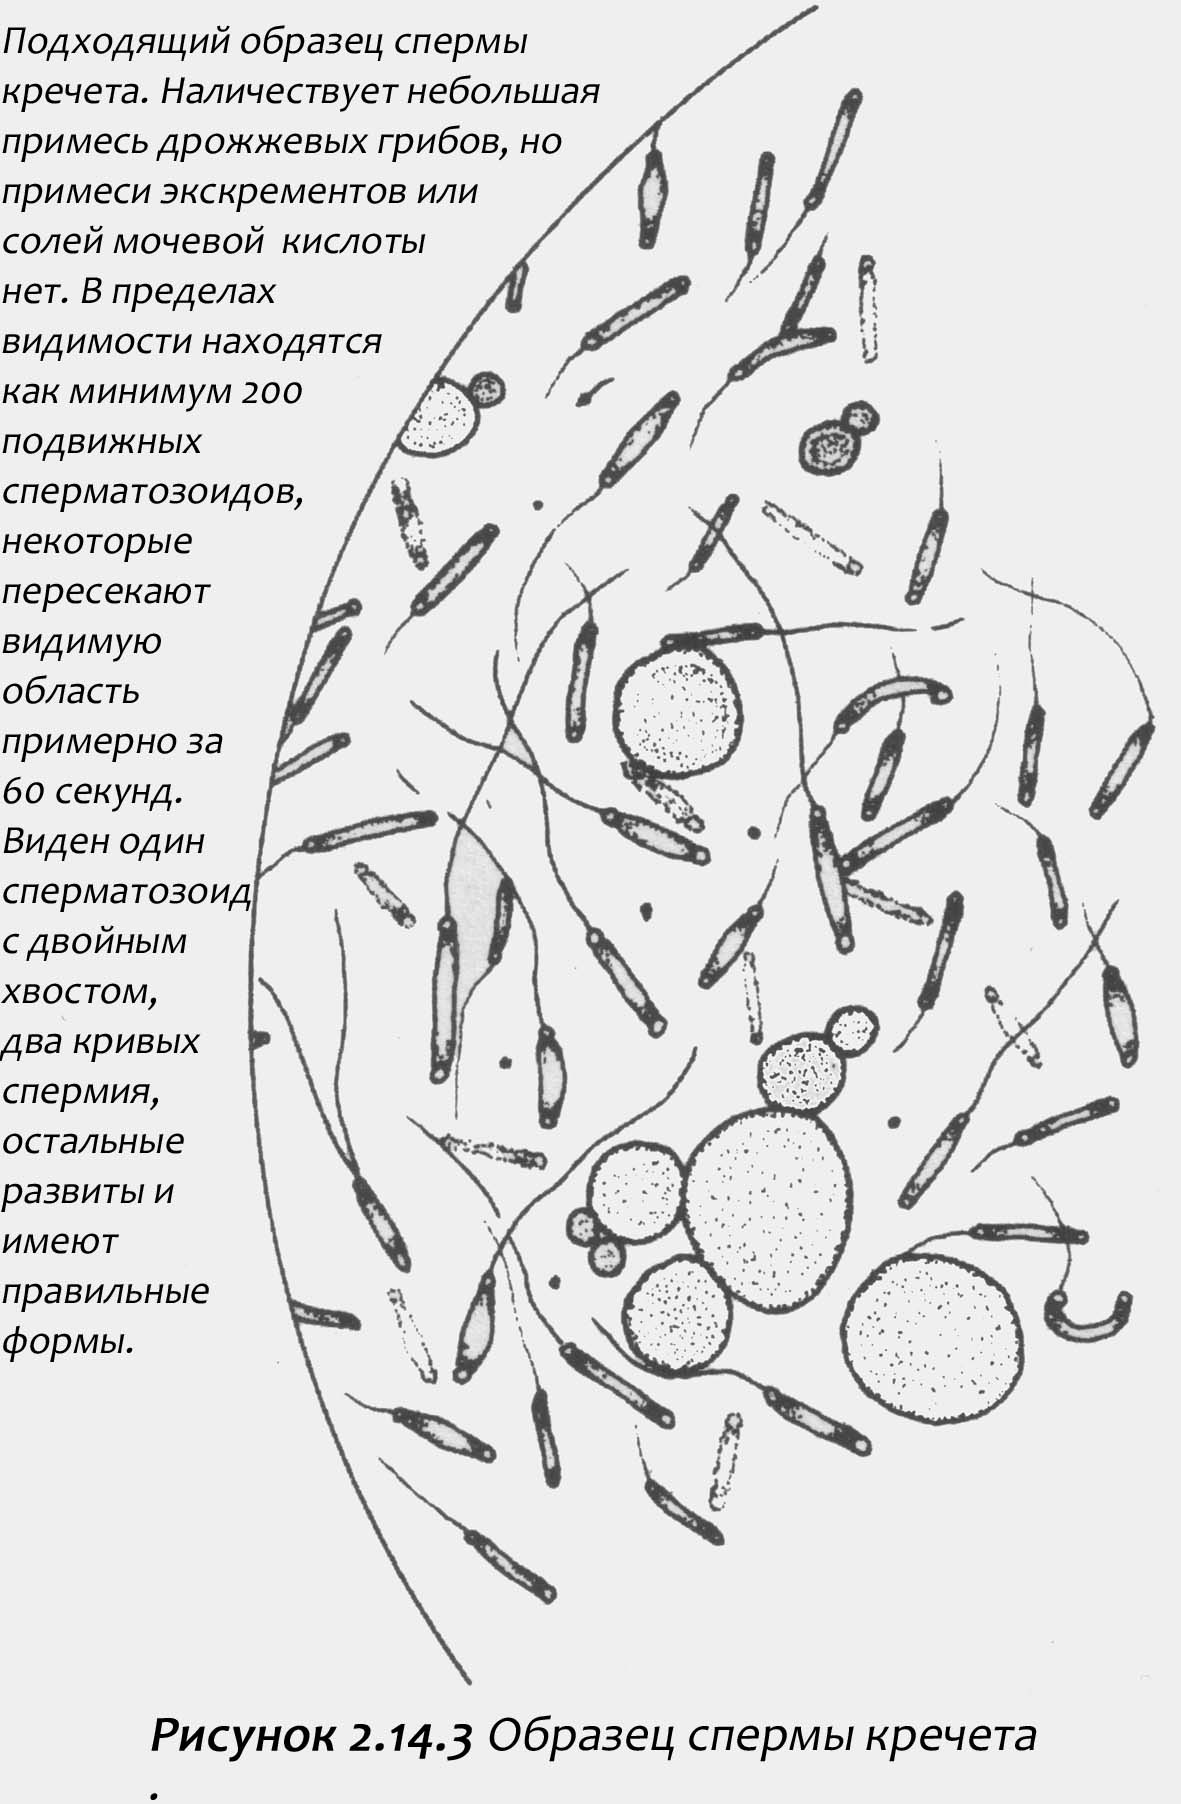 temniy-tsvet-spermi-u-muzhchini